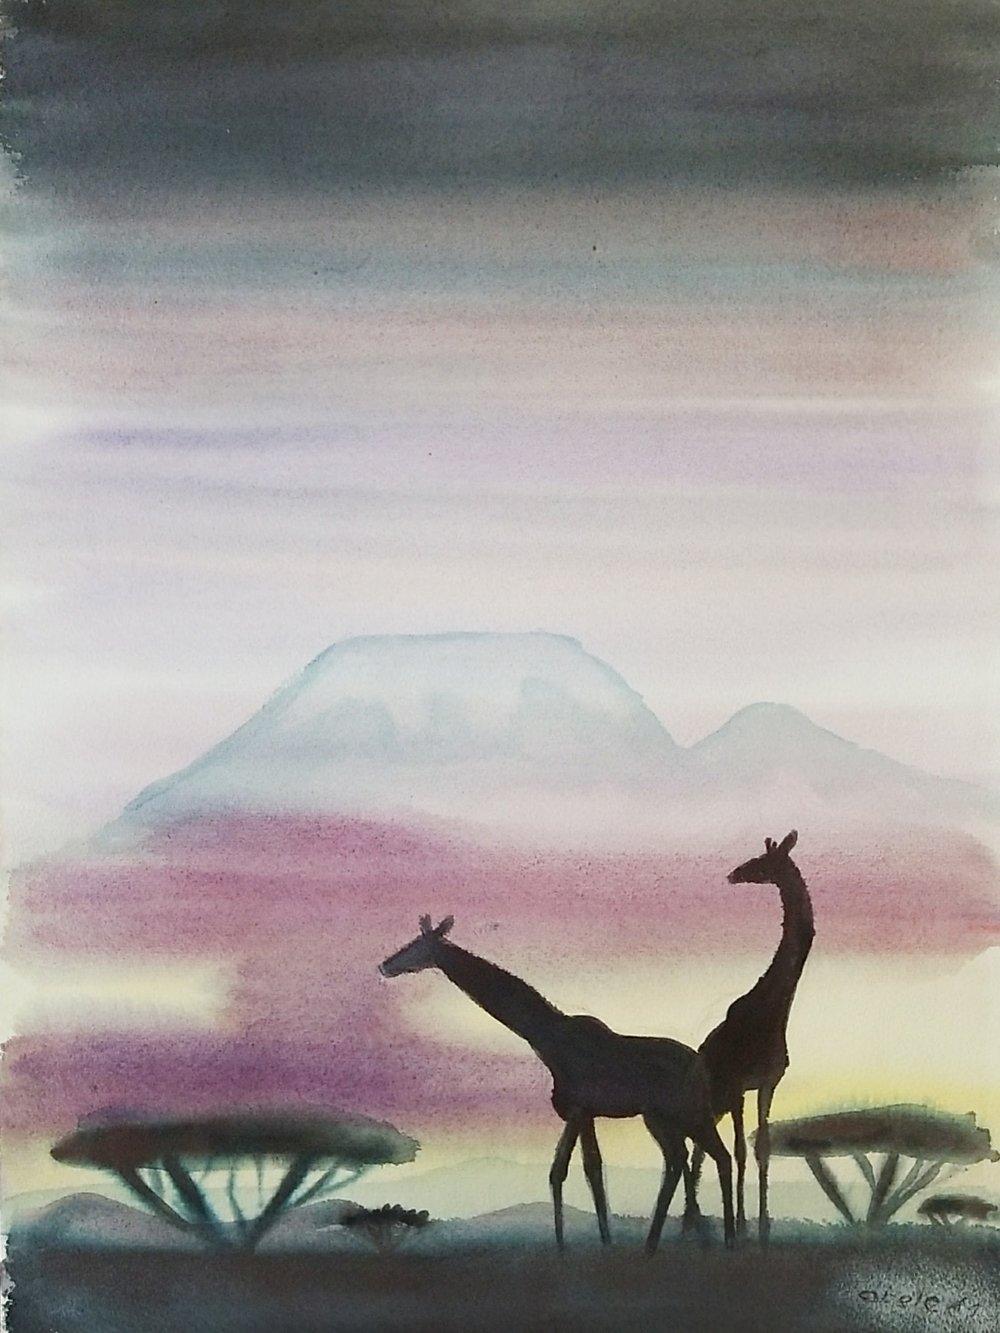 Giraffen in Schatten des Kibo Tansania / Giraffes in the Shadow of Kilimanjaro